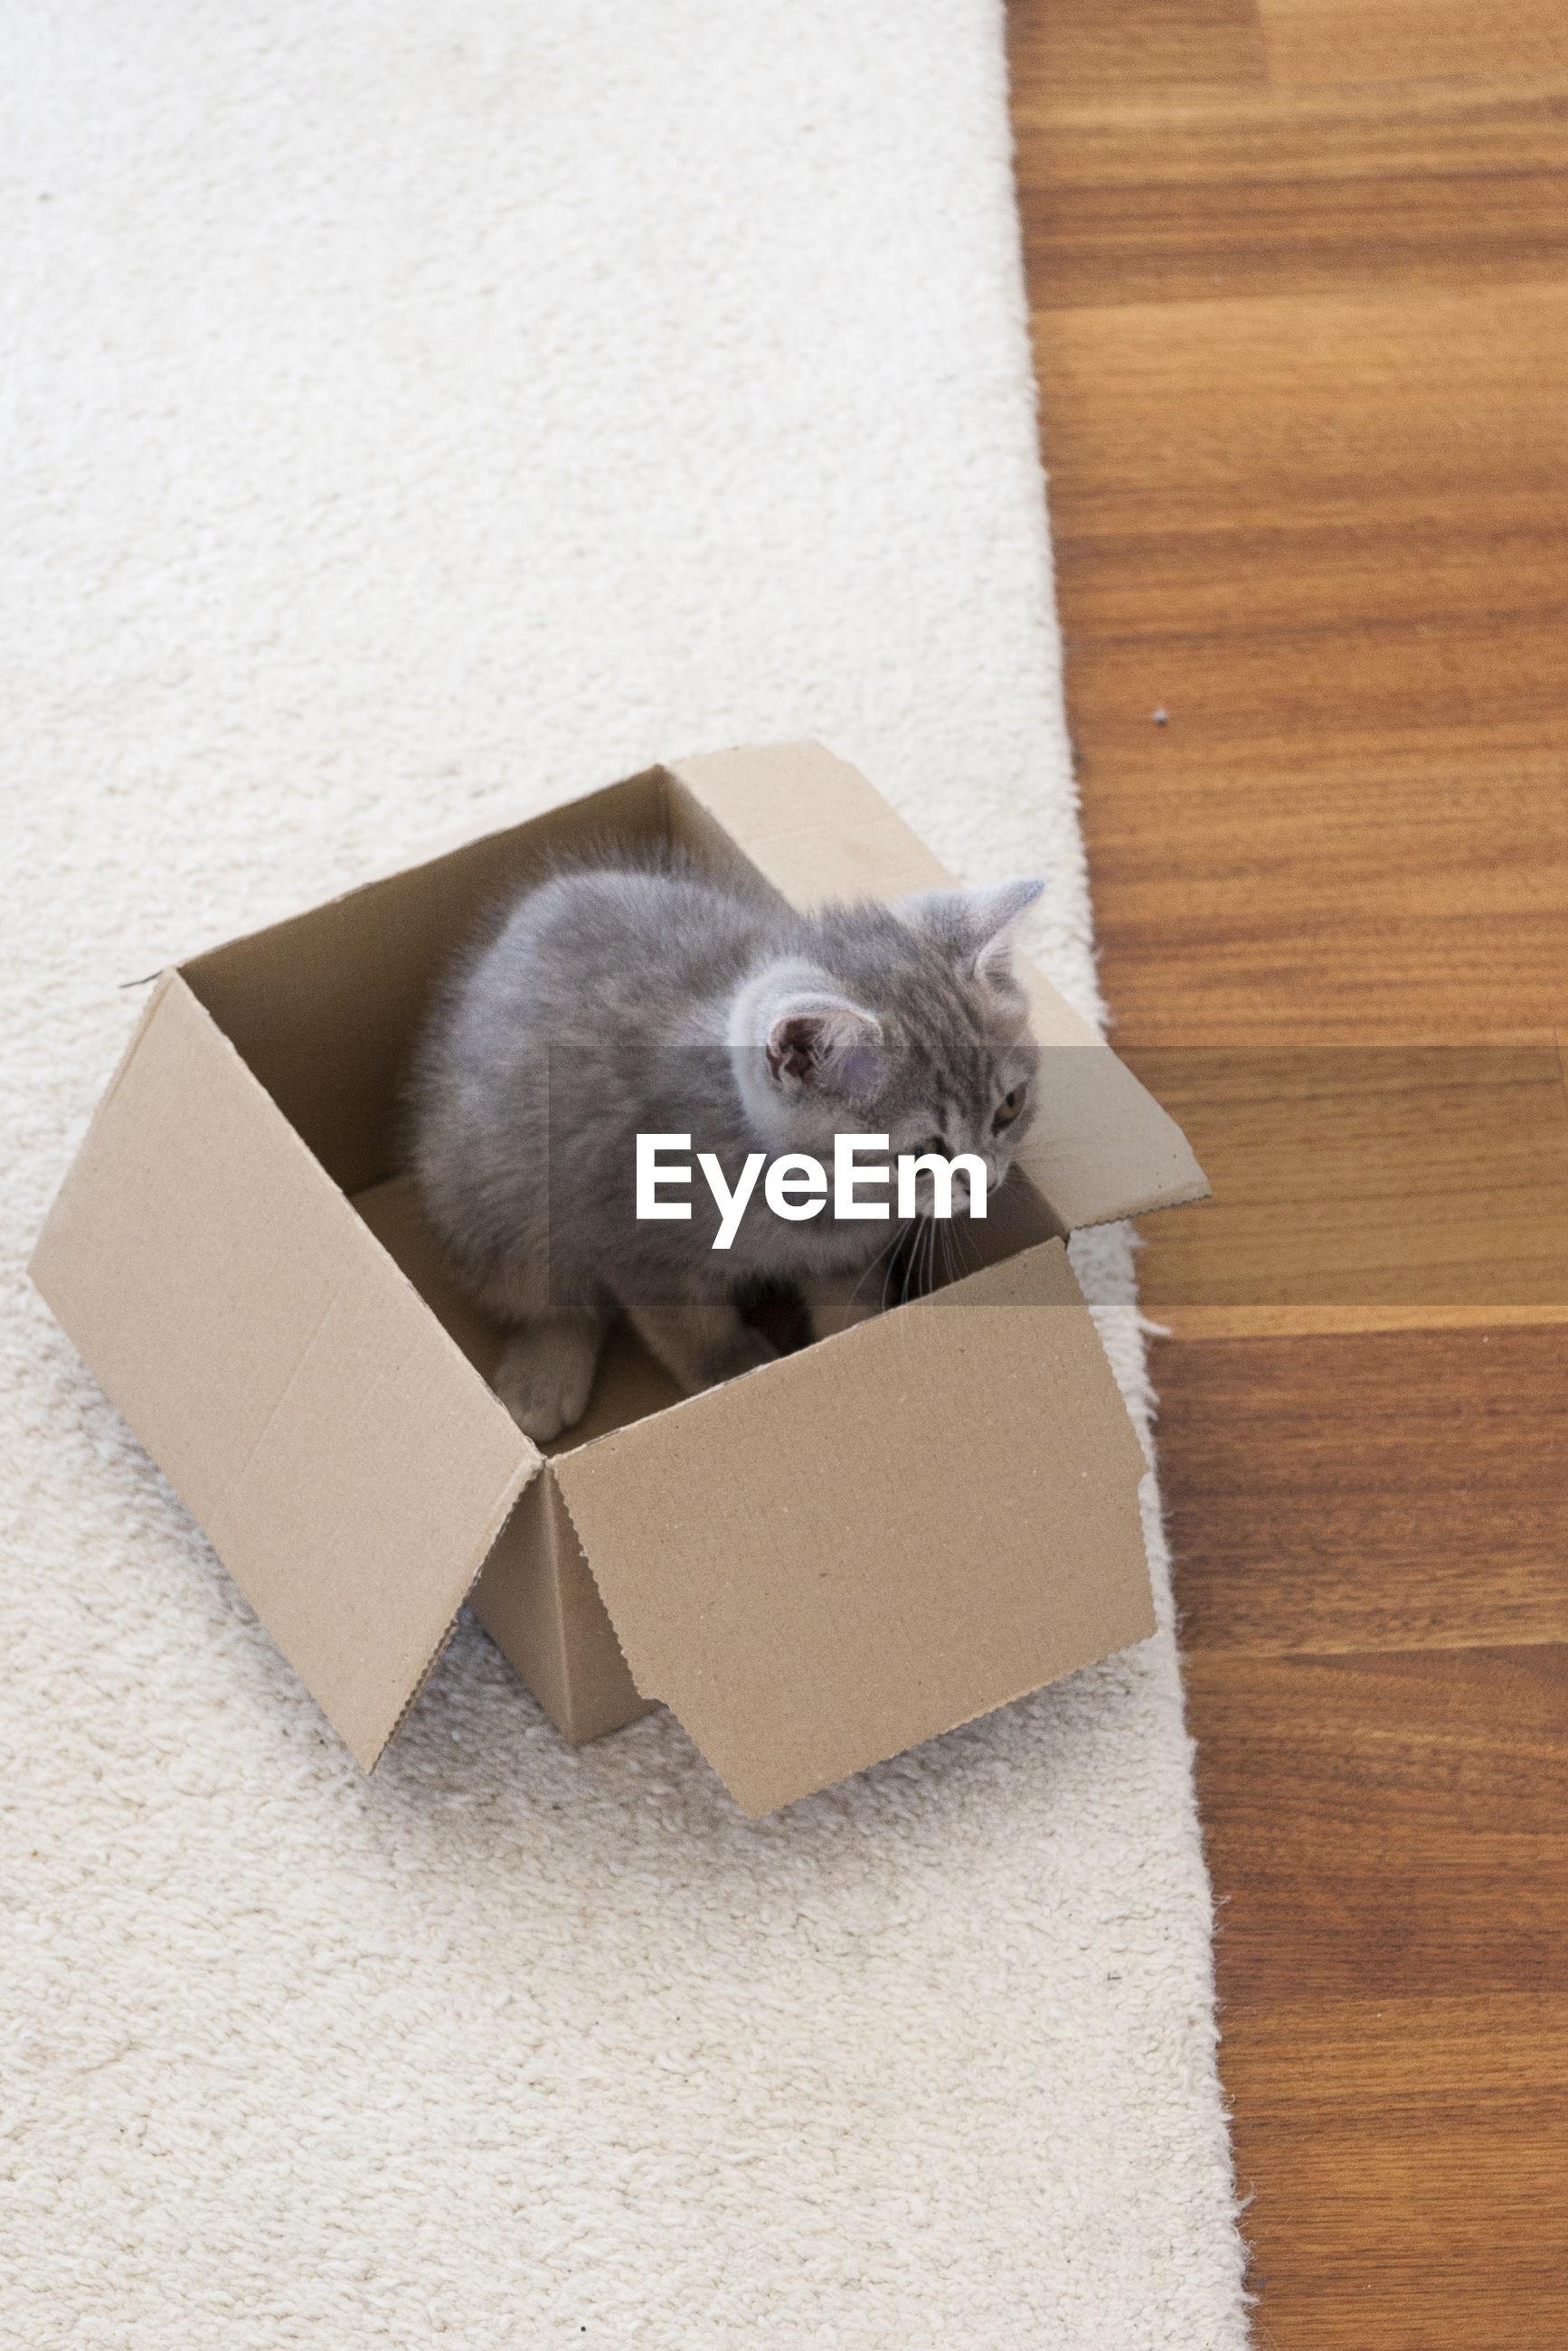 CAT LYING ON BOX IN TRAY